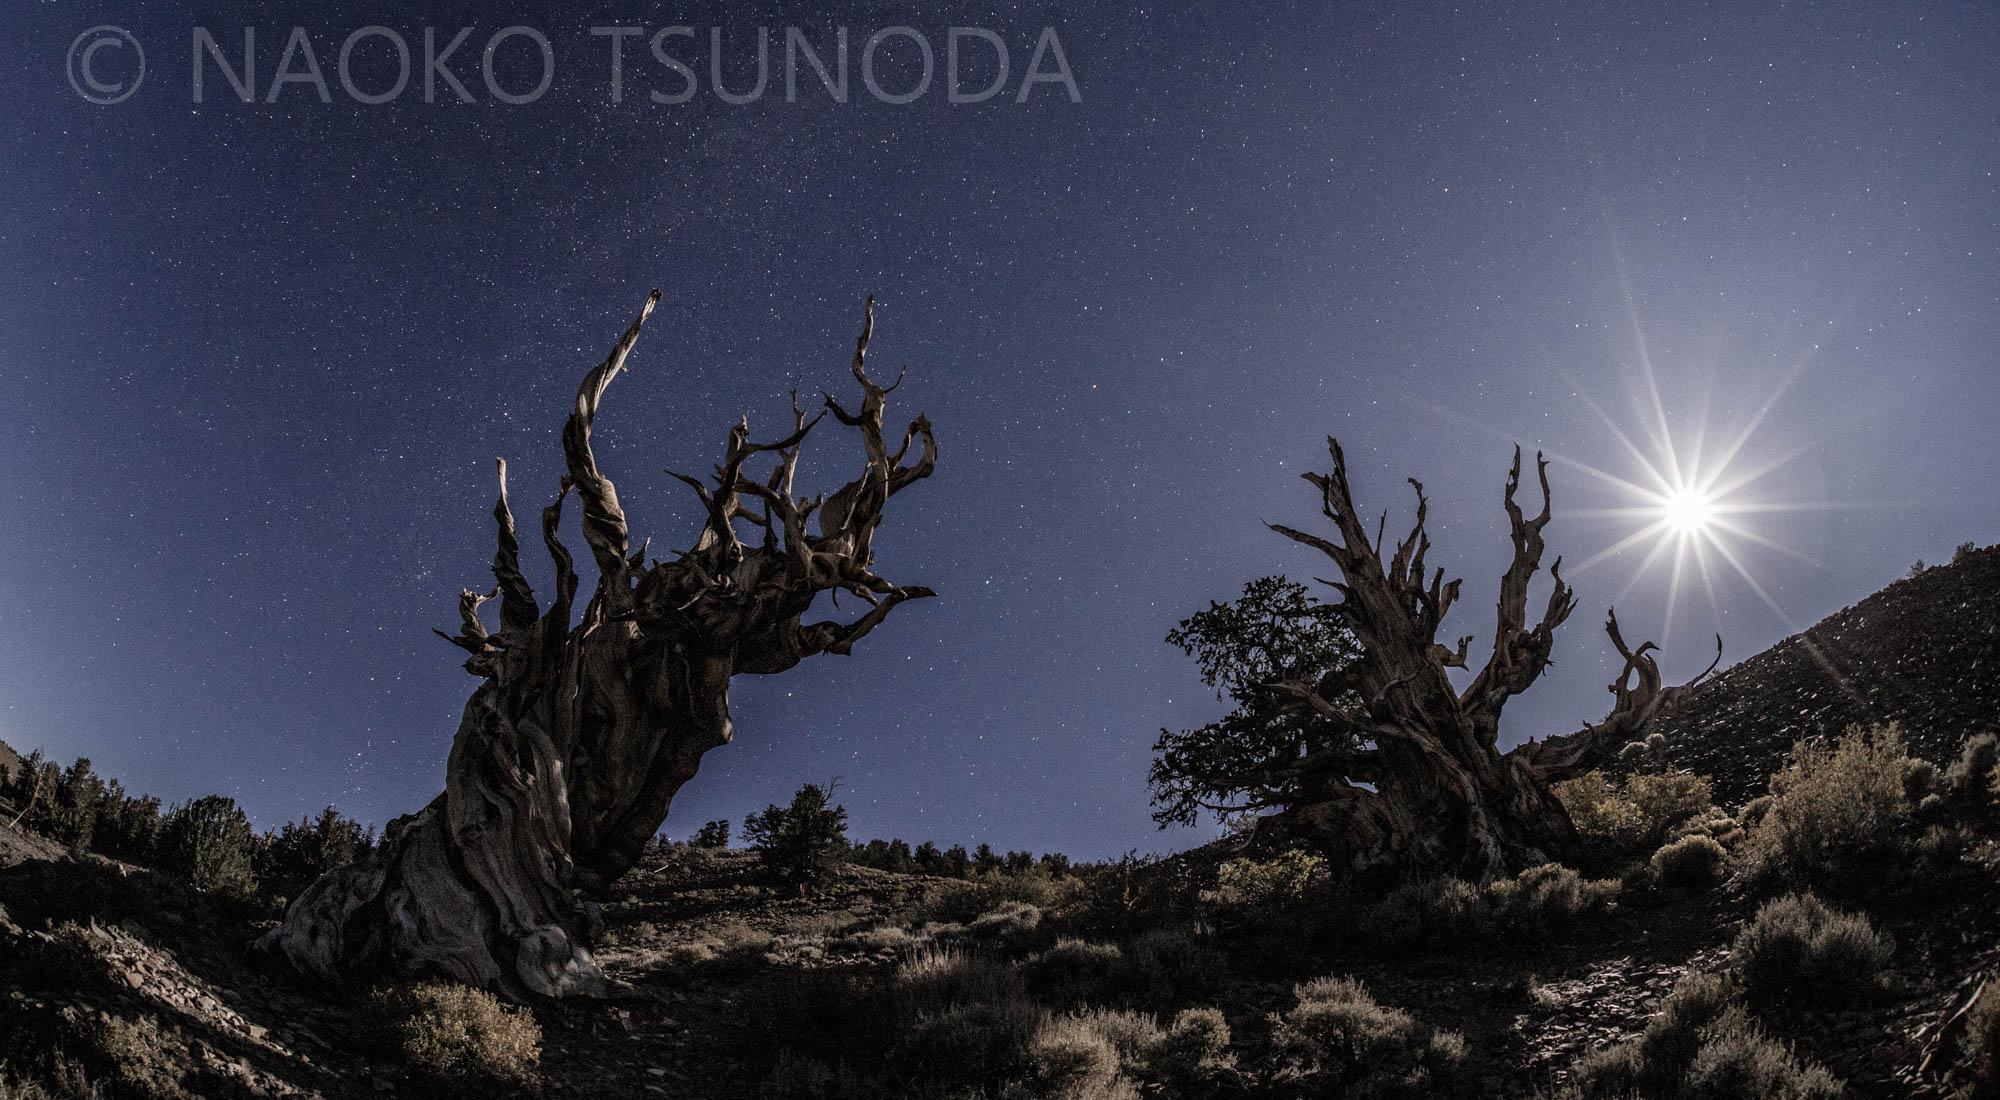 Naoko Tsunoda Photography